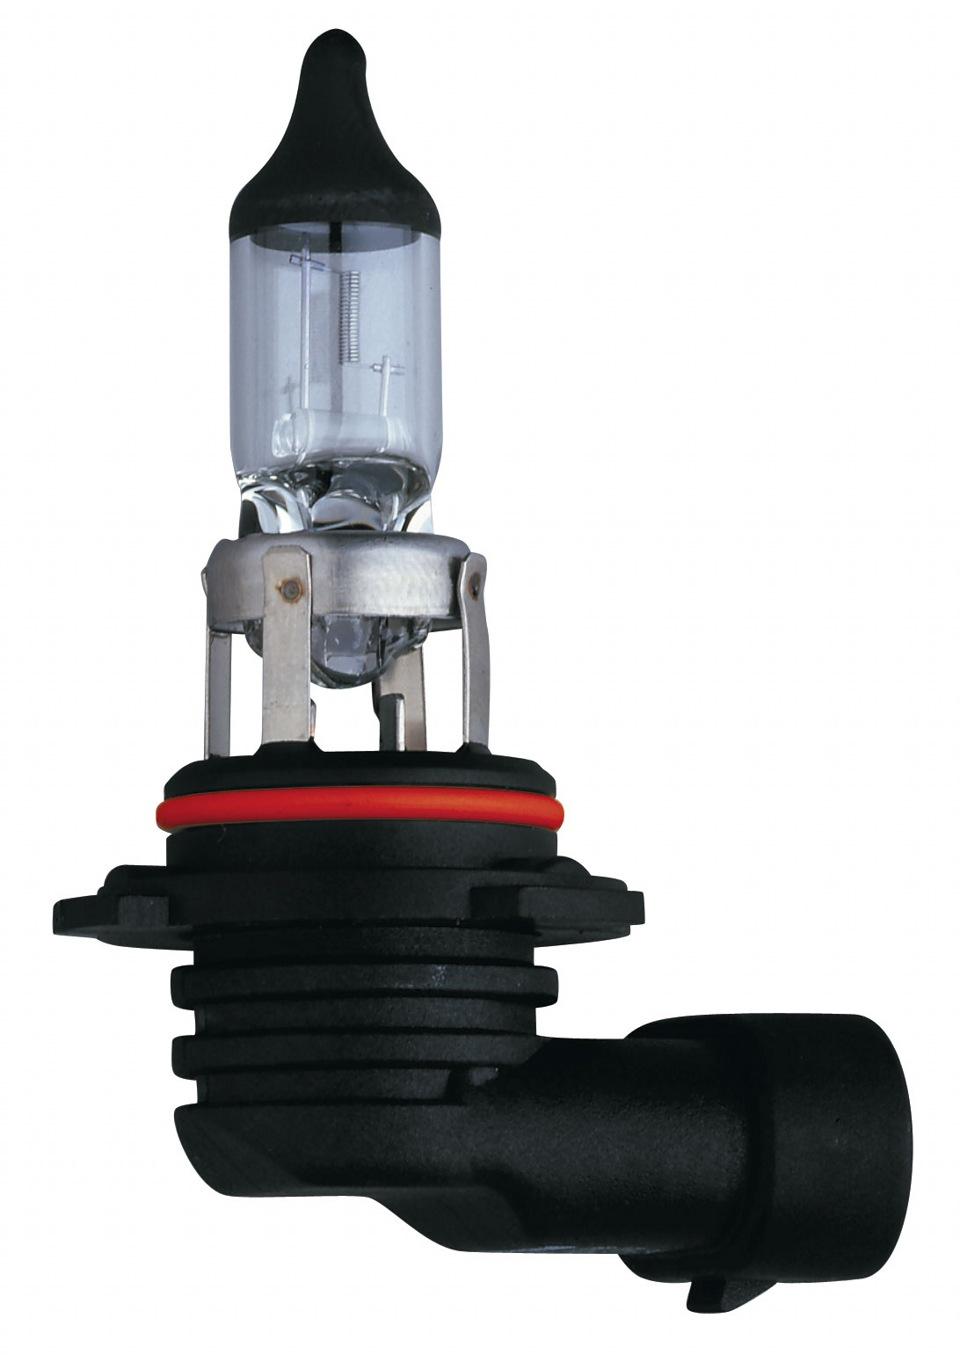 GENERAL ELECTRIC Лампа автомобильная HB 12V 51W P22D в блистере, 1 шт.